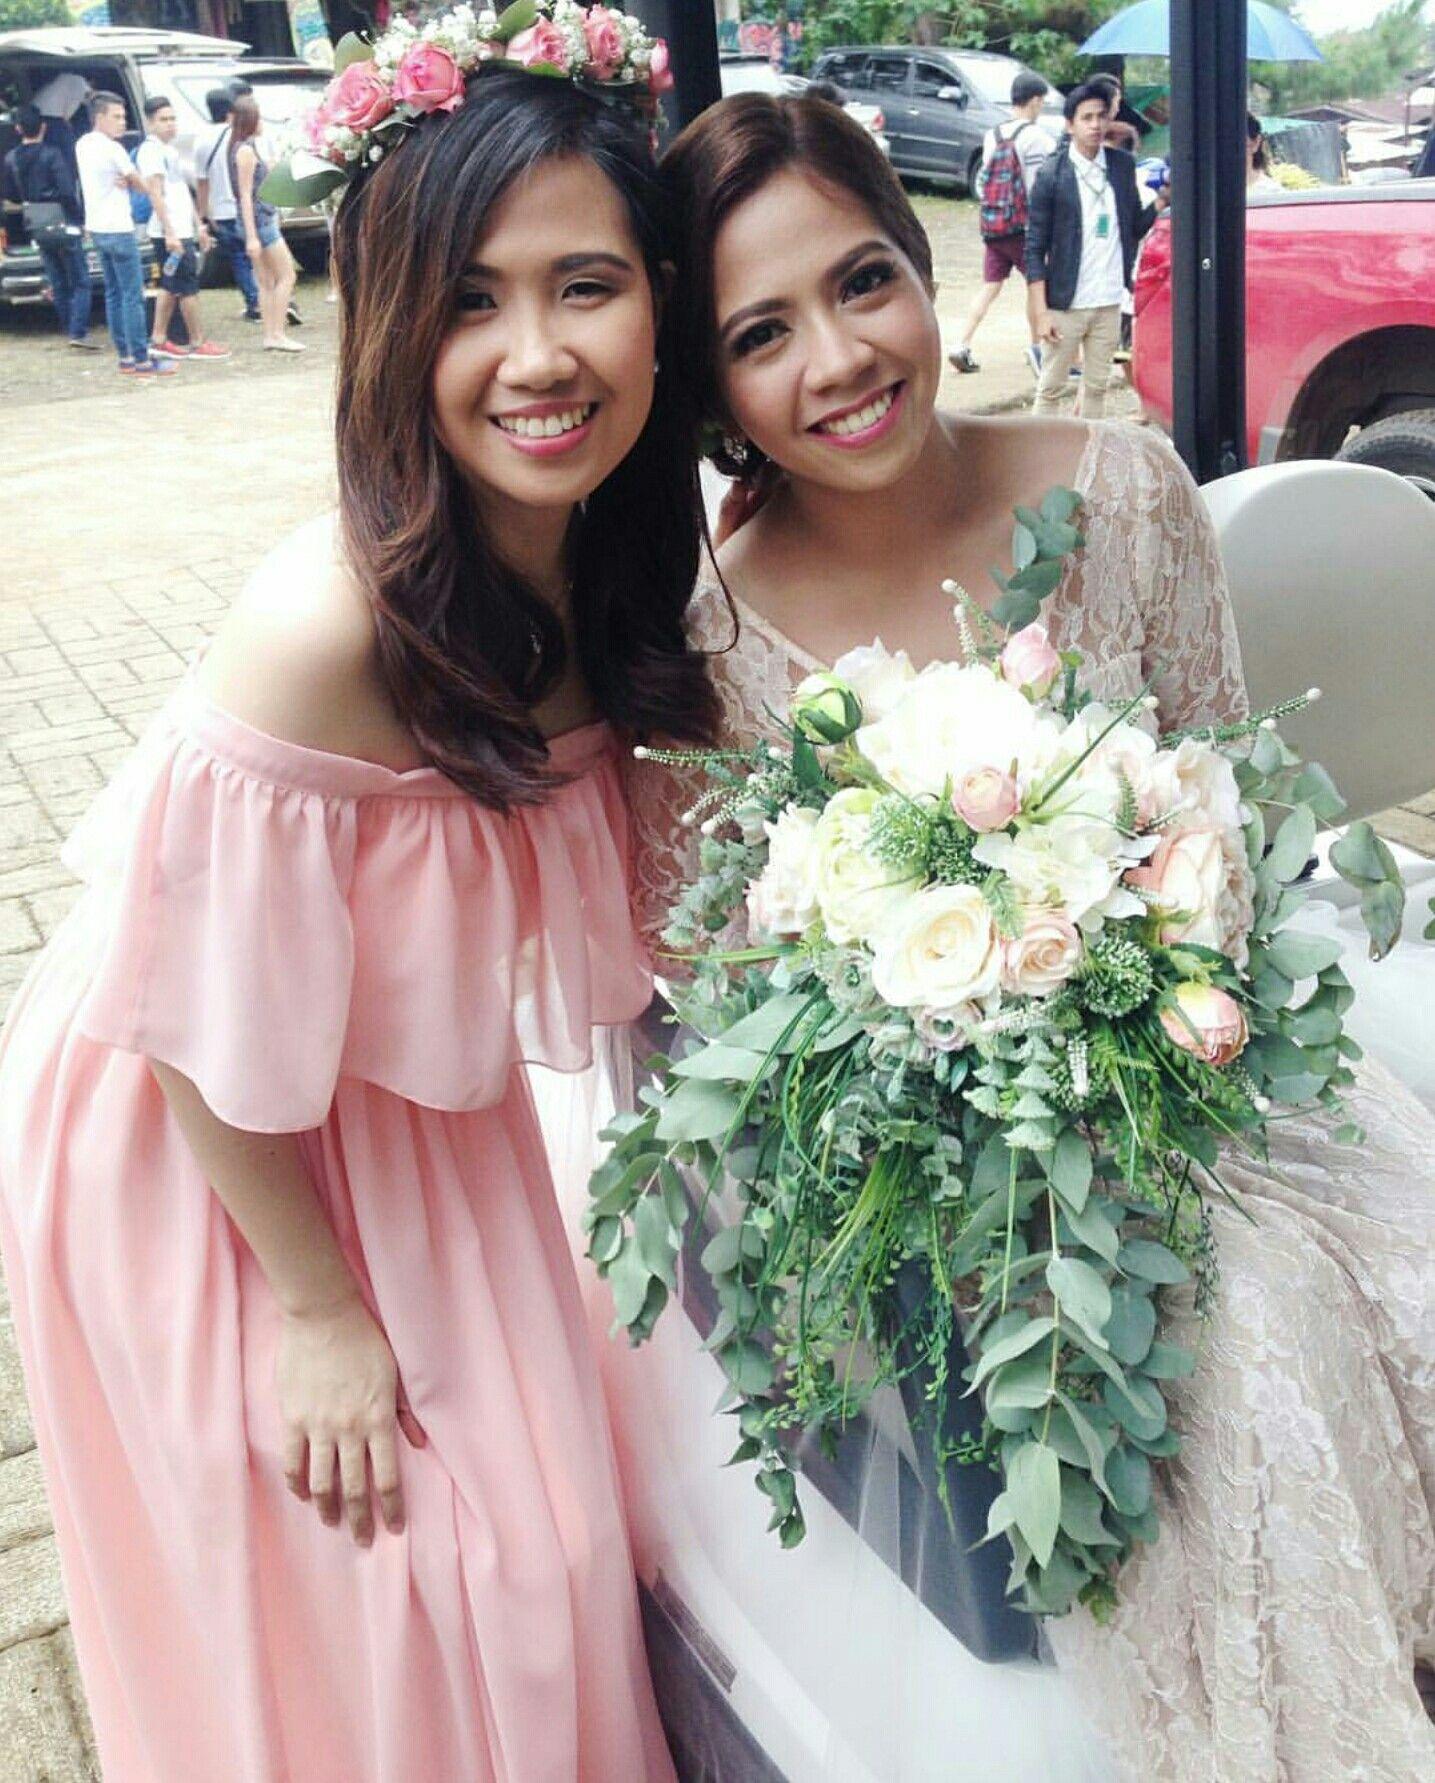 #maidofhonor #bestfriend #Ryehan2become1  #davaoweddings #weddingsph